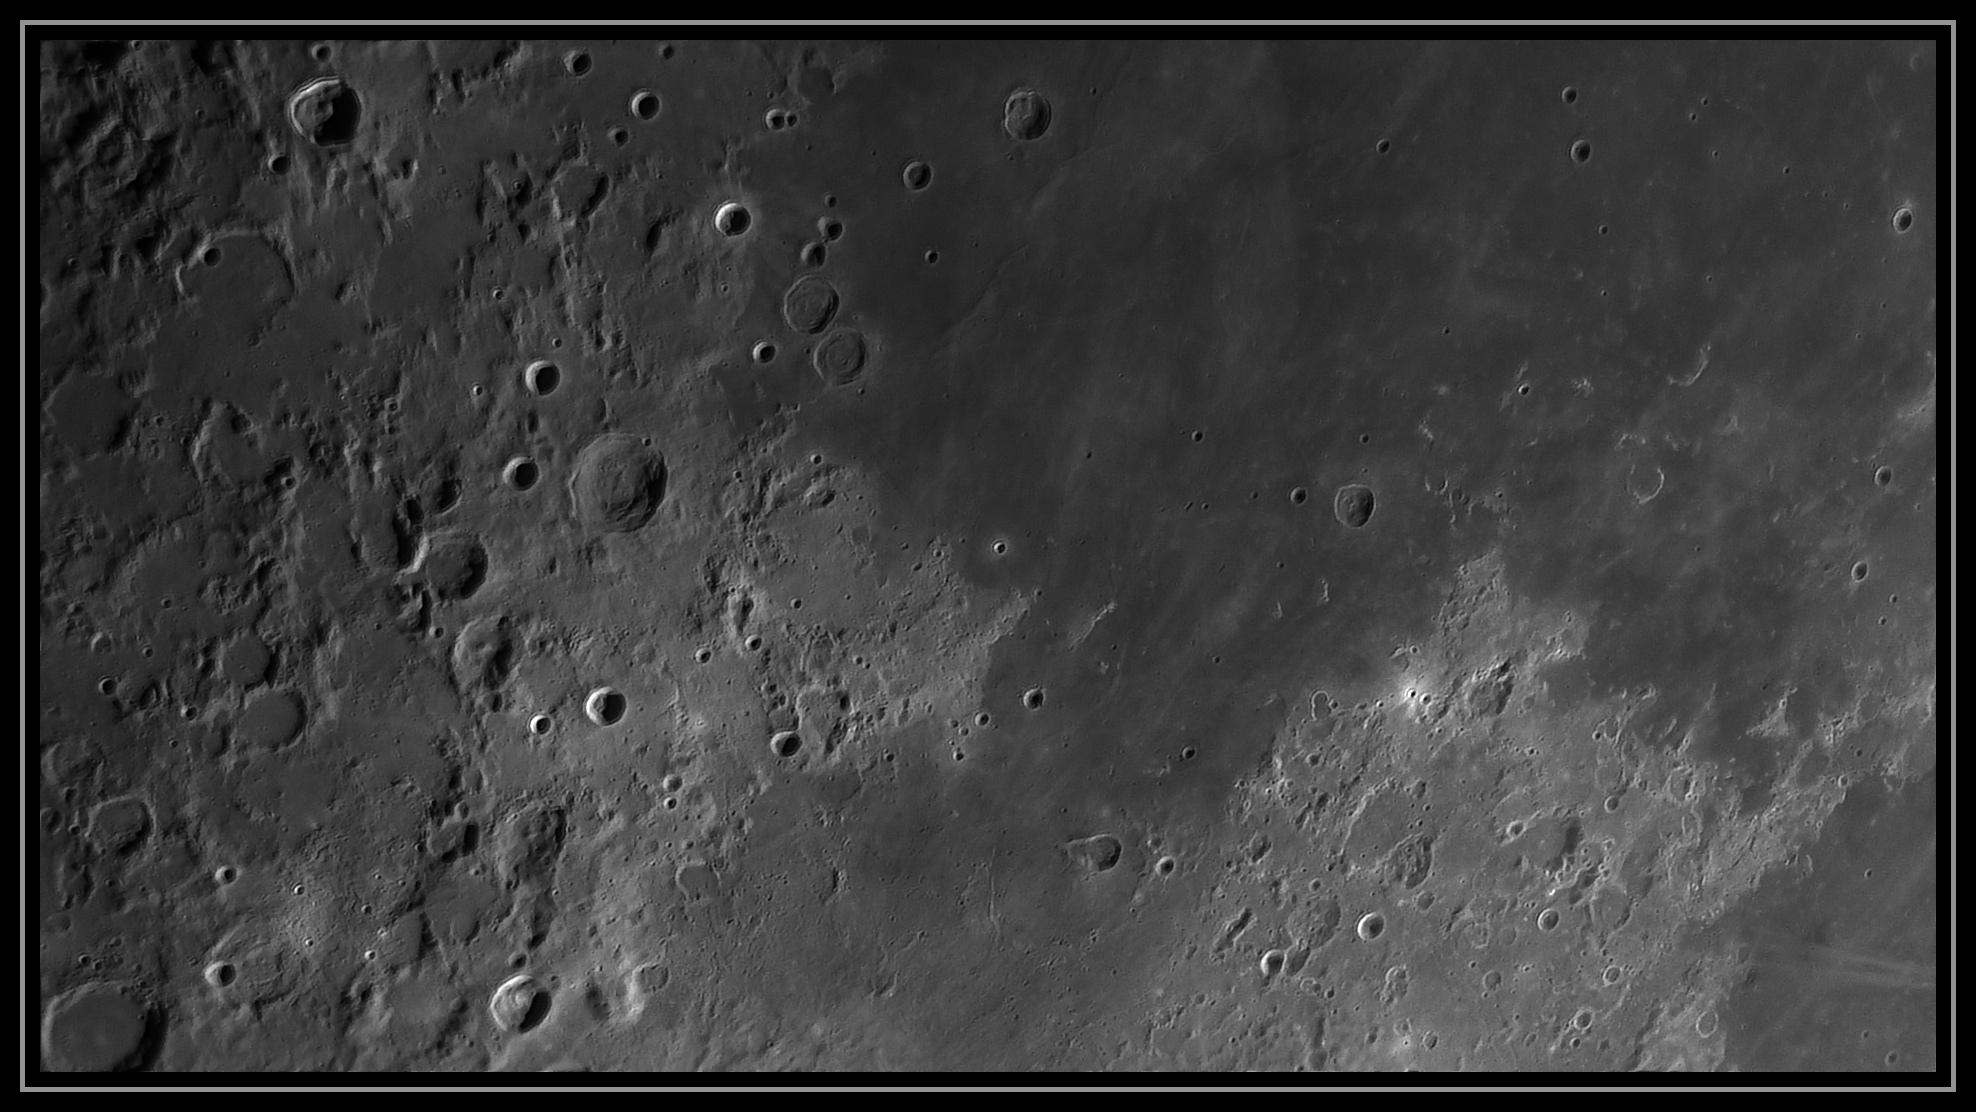 5e36a098ec9df_Moon_181331_010220_ZWOASI290MM_Rouge_23A_AS_P25_lapl4_ap1036.jpg.12c8954d2b19e19093cfae0cc64c4537.jpg